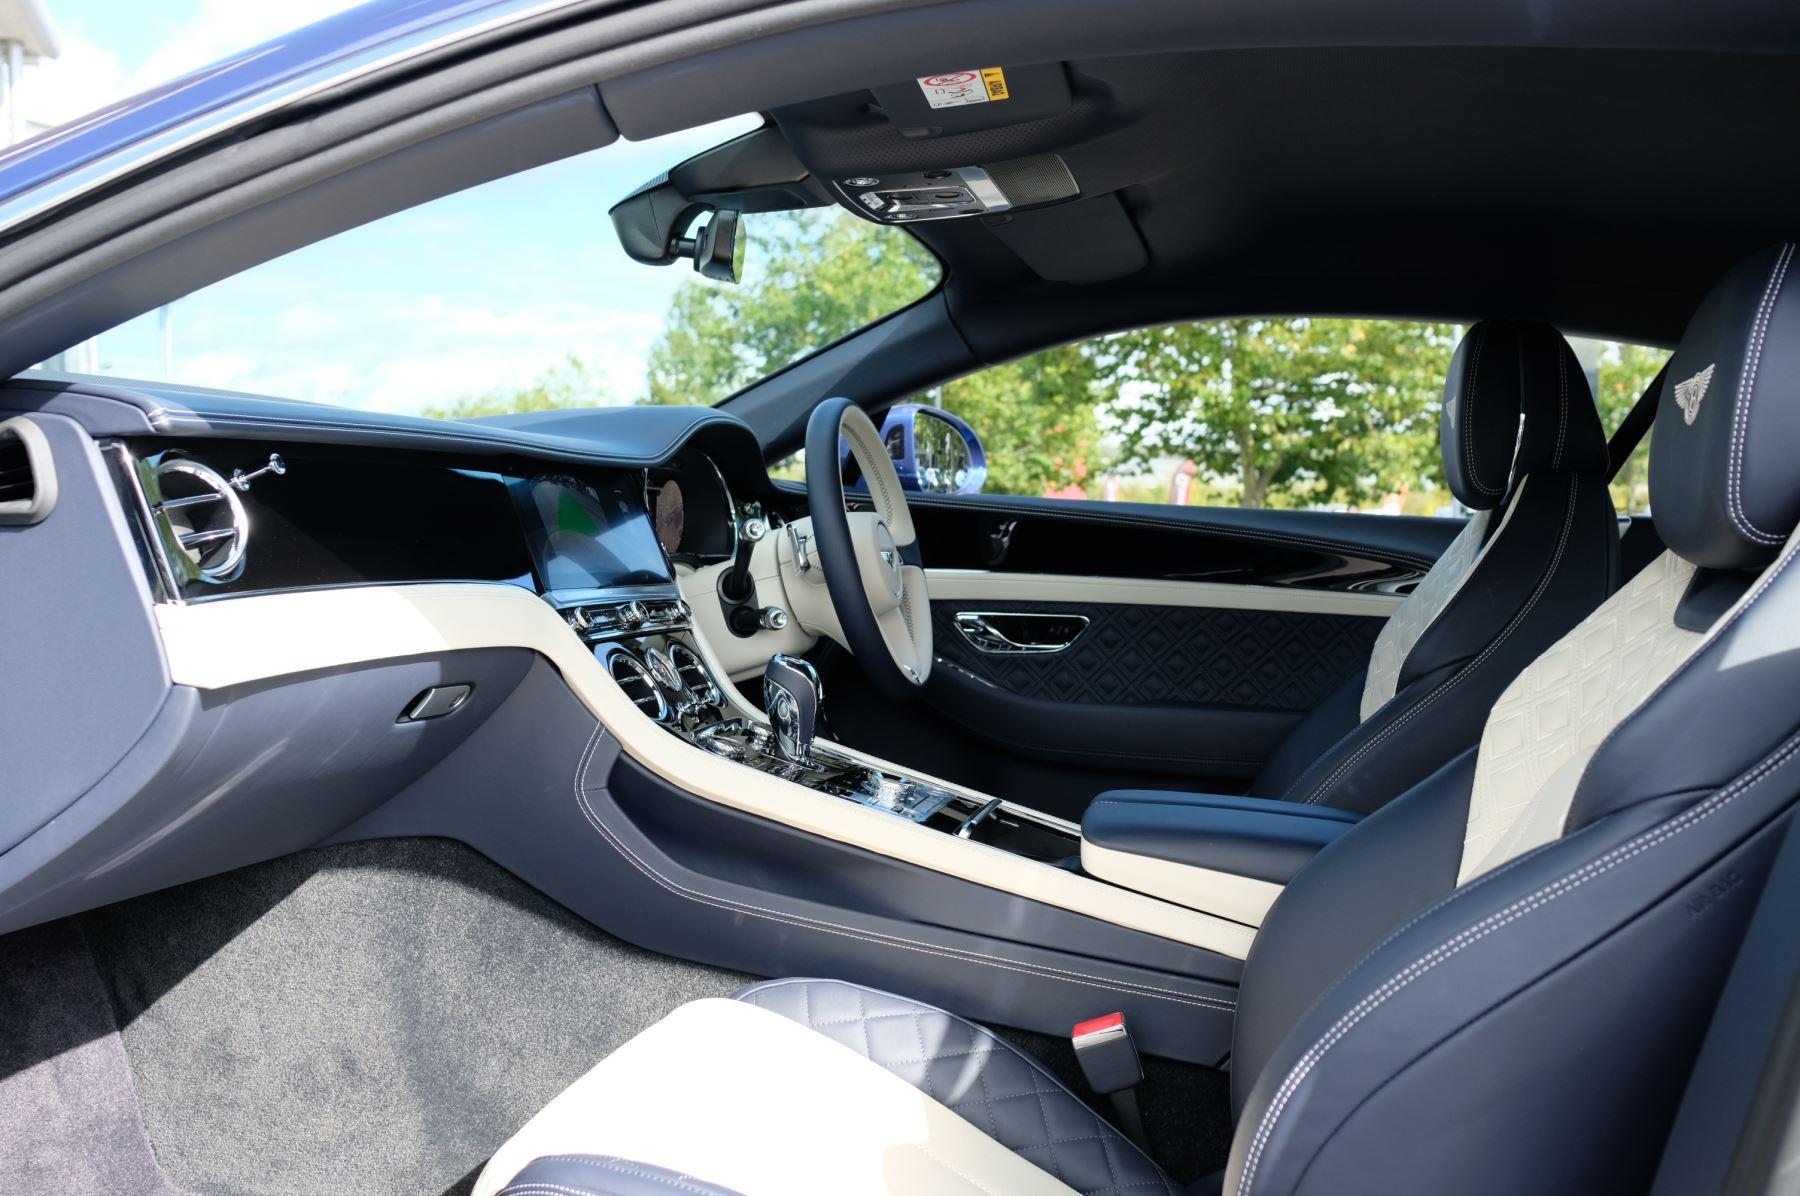 Bentley Continental GT 4.0 V8 2dr Mulliner Driving Specification image 13